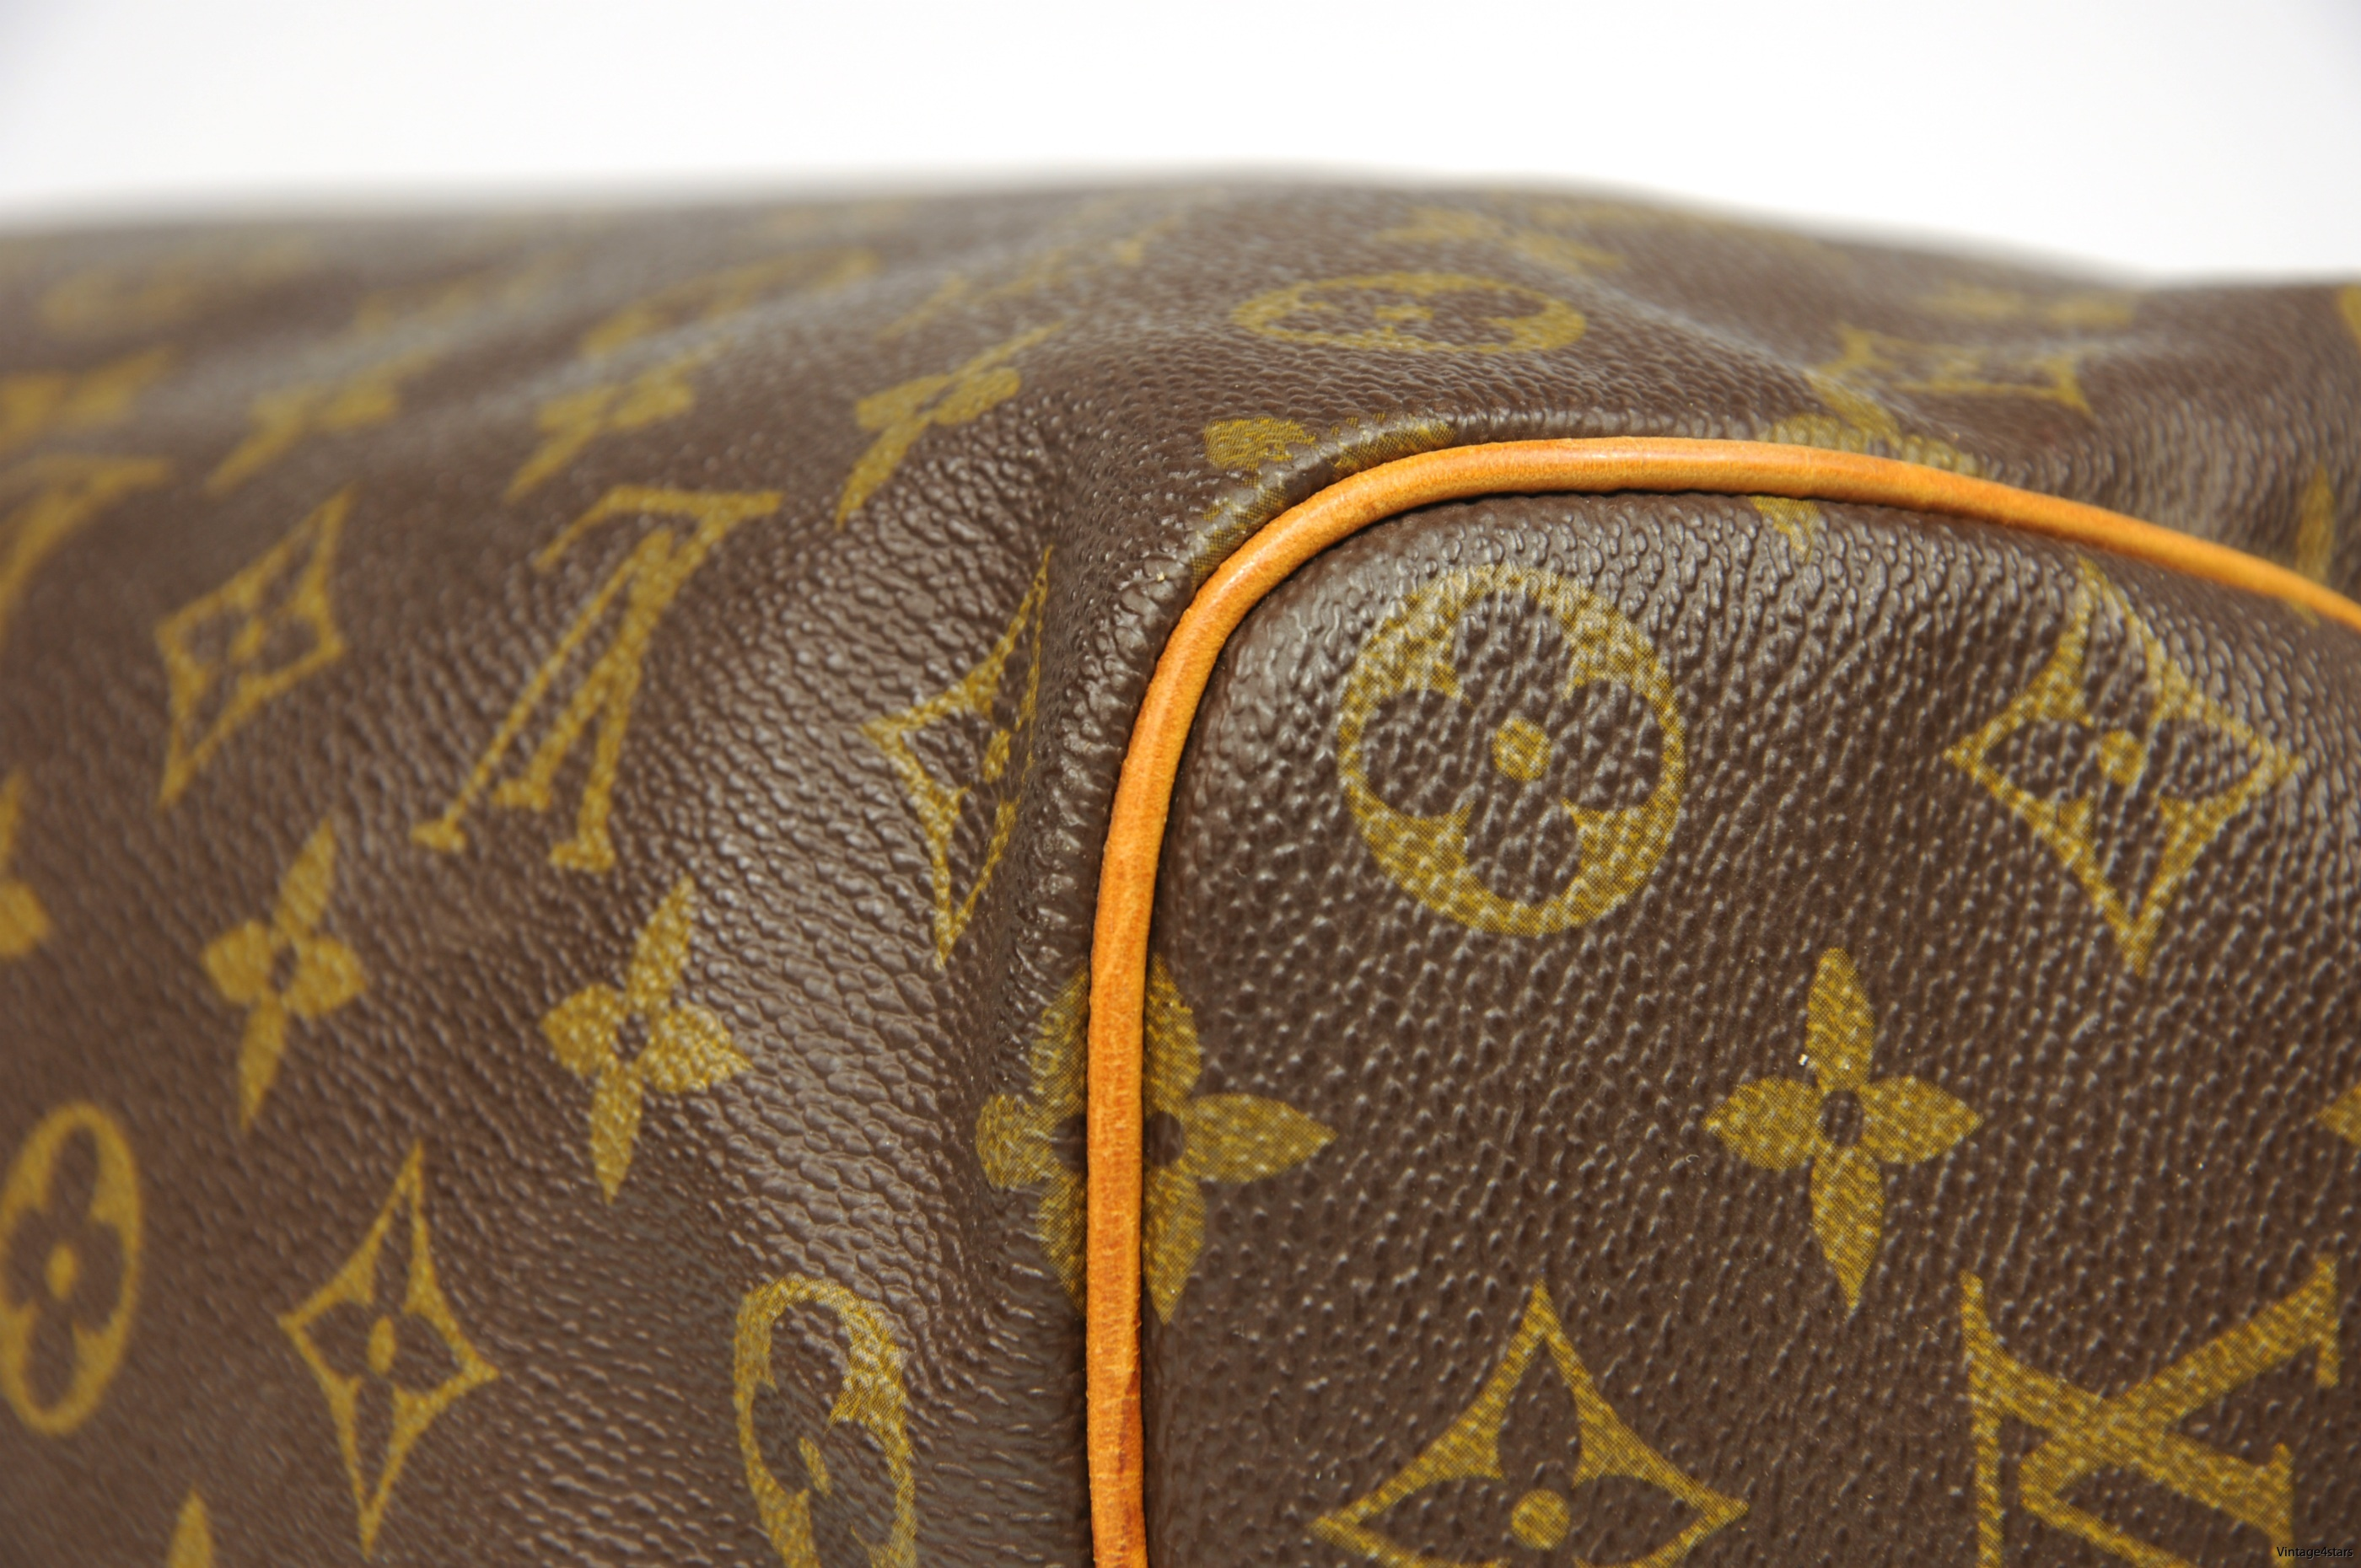 Louis Vuitton Speedy 35 Monogram 3